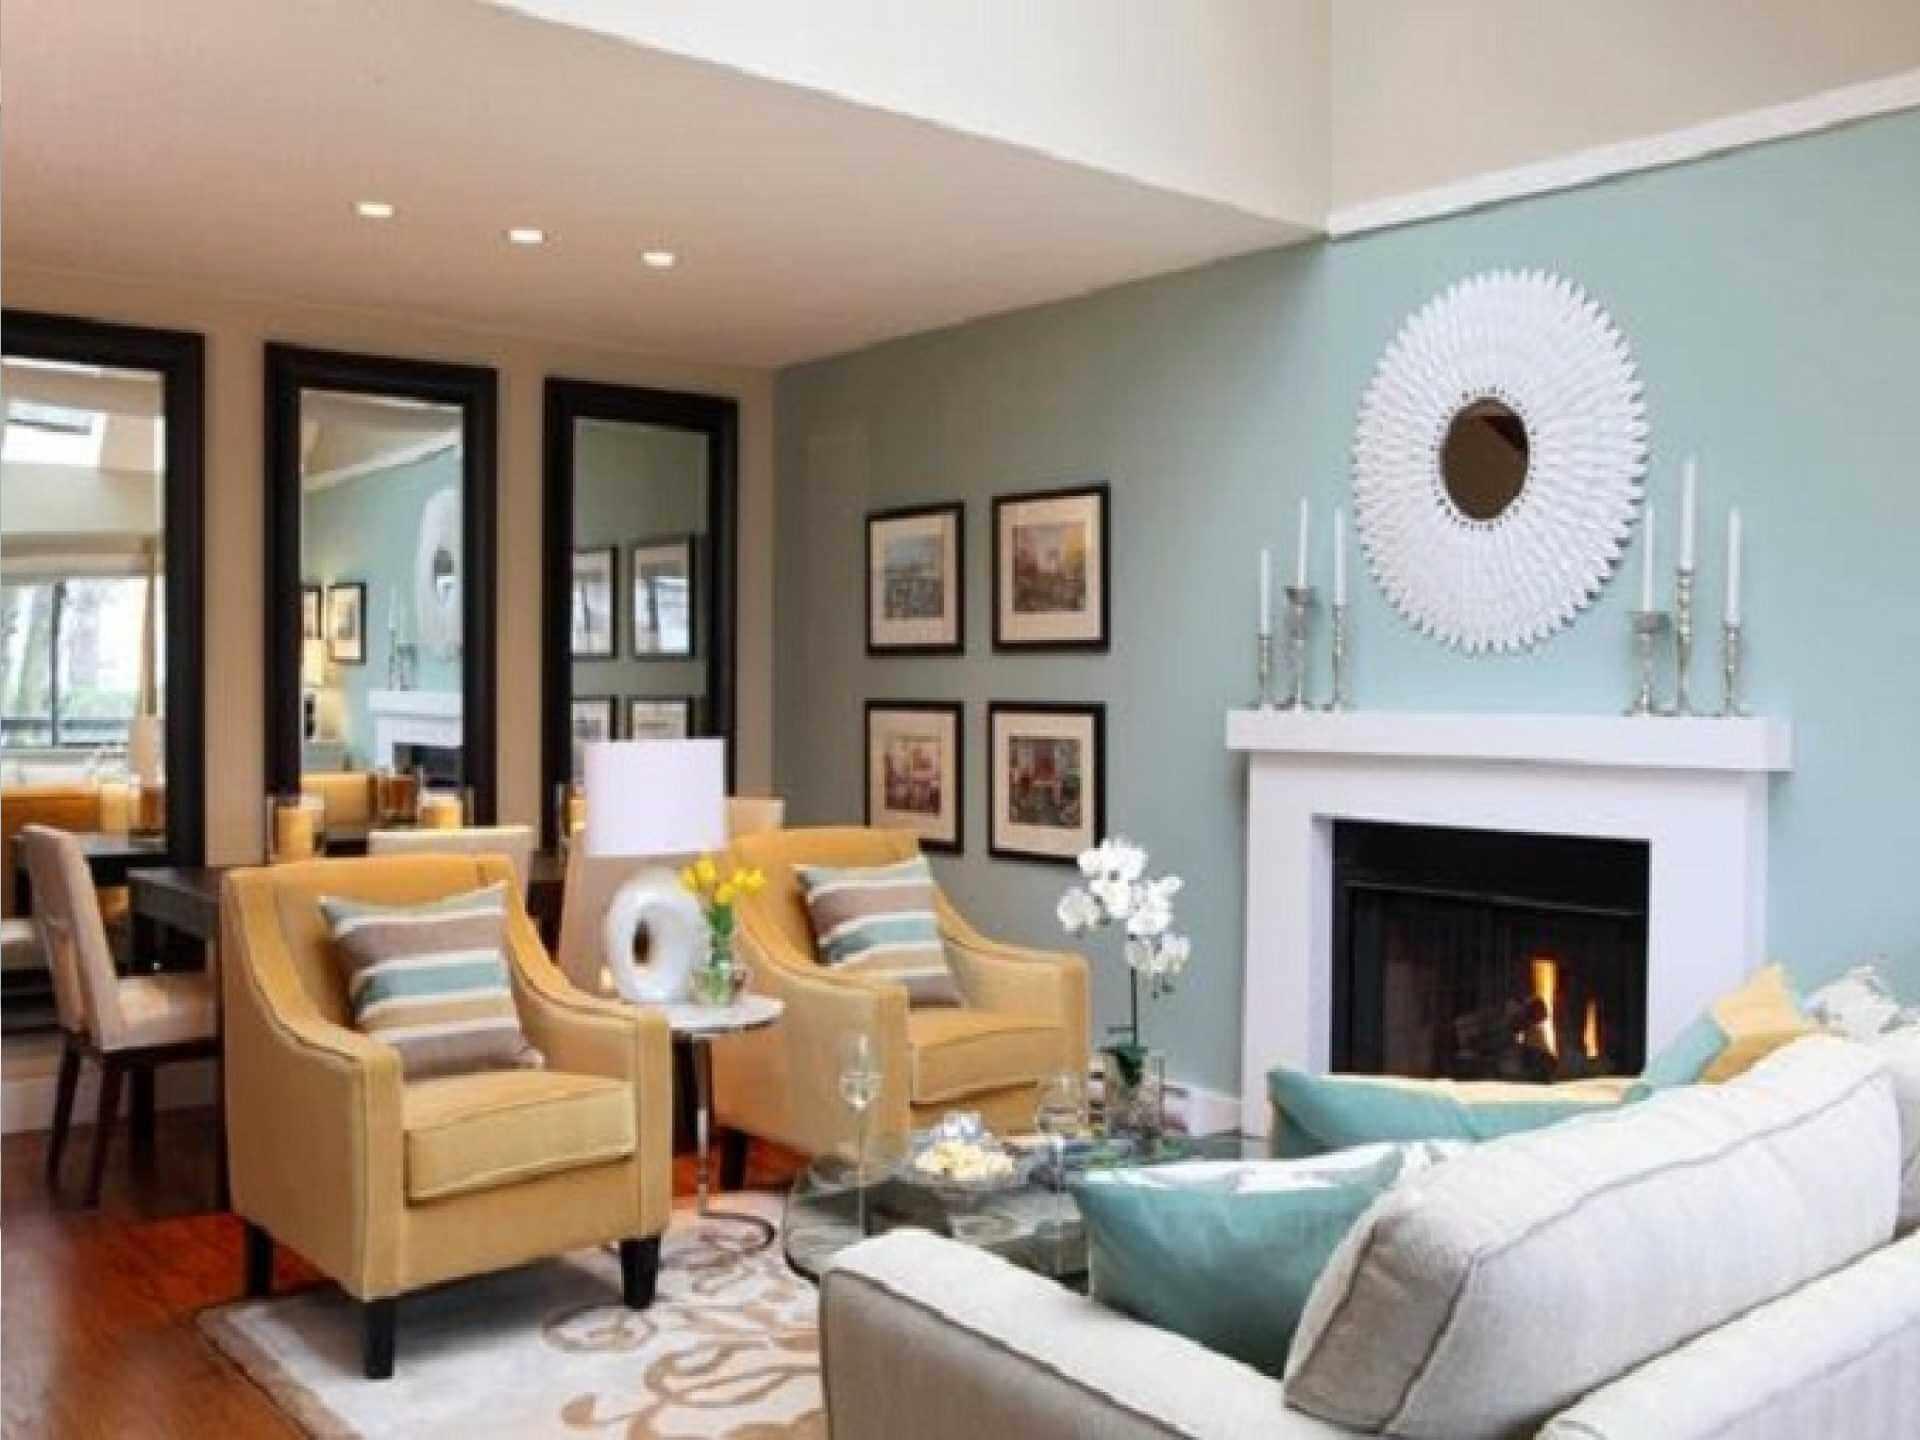 Blue Color Decoration Ideas For Living Room: Trendy Living Room Color Schemes 2017 & 2018